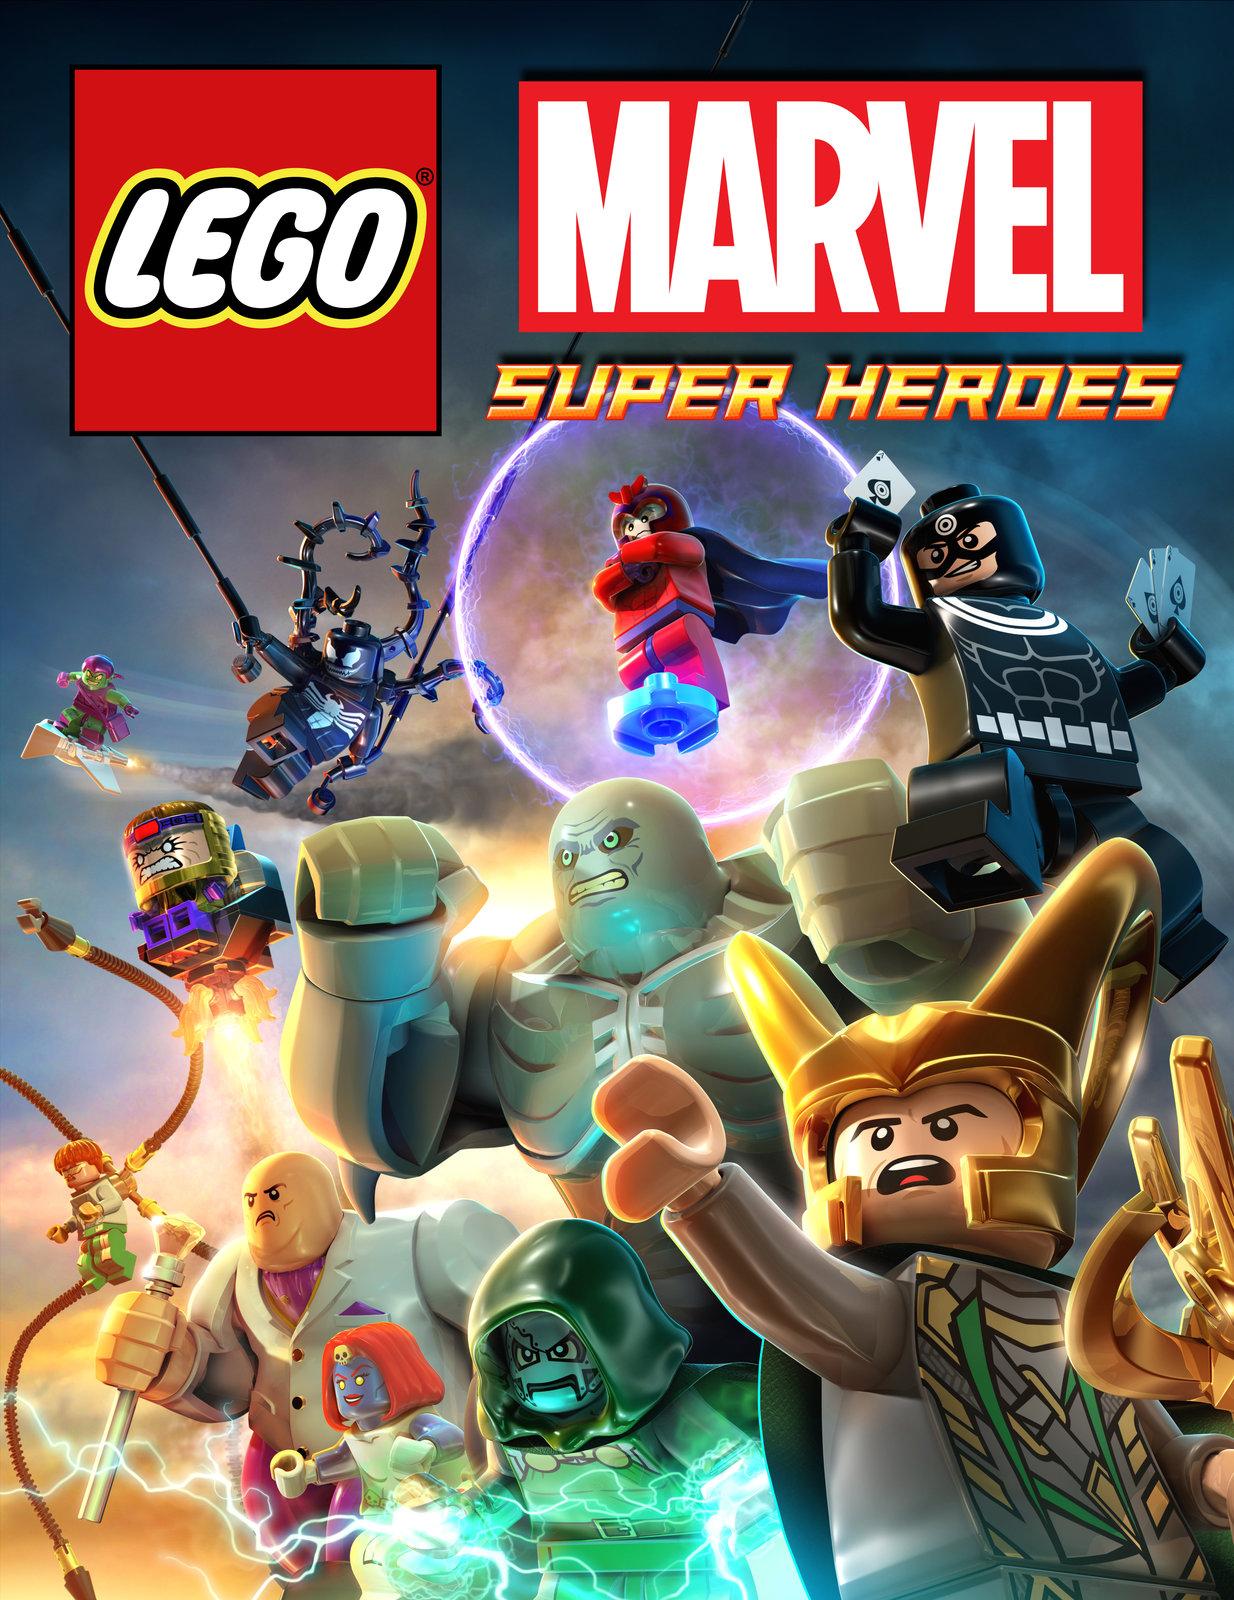 lego marvel superheroes q a panel and screens. Black Bedroom Furniture Sets. Home Design Ideas